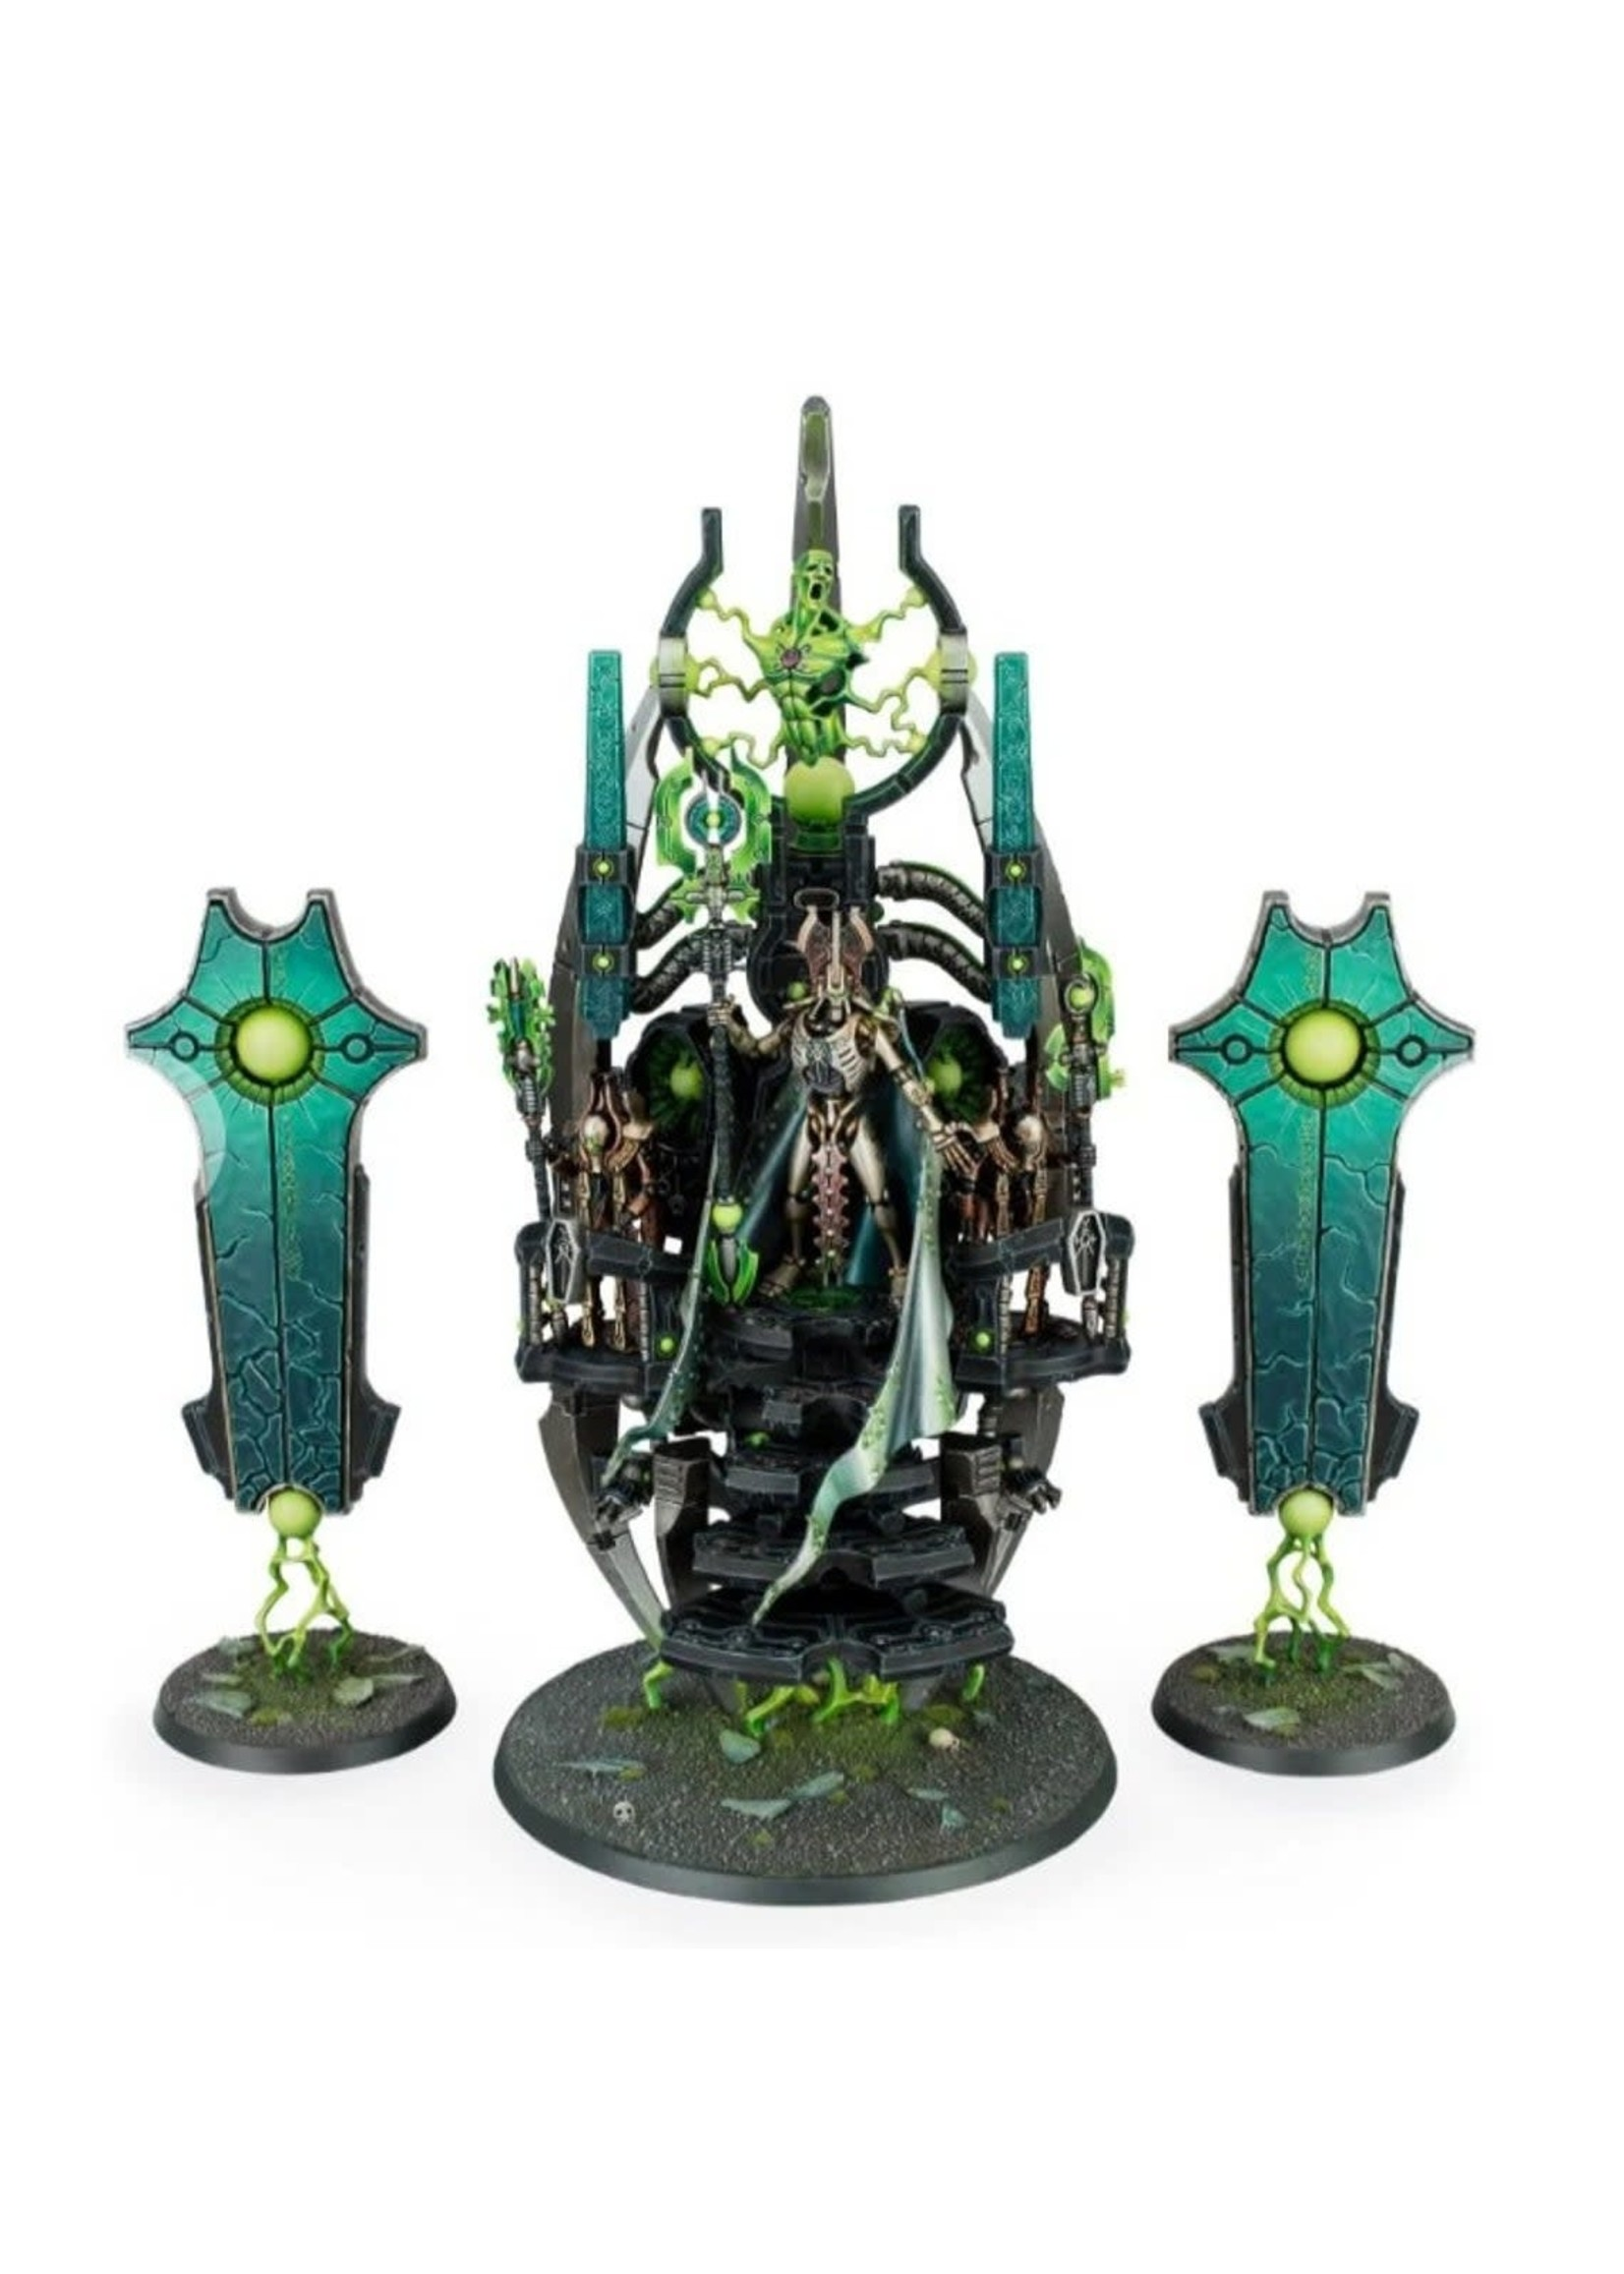 Warhammer: 40K Necrons Szarekh The Silent King